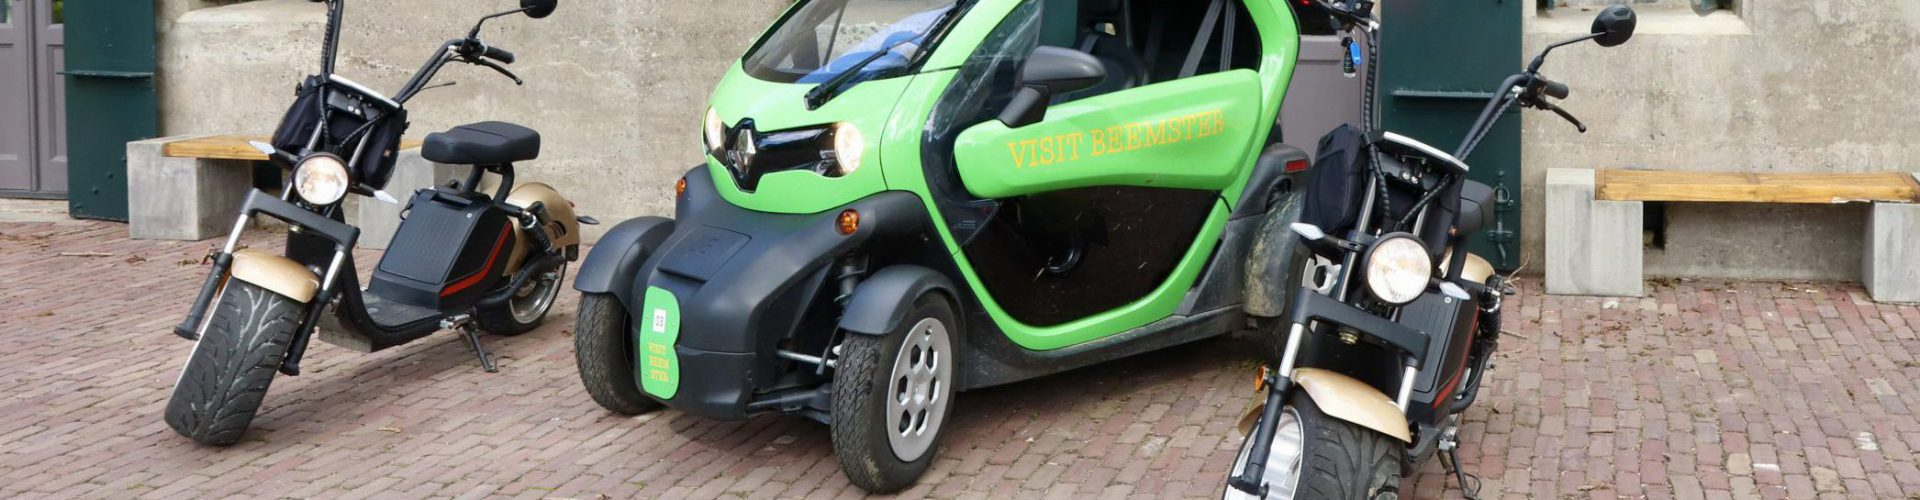 VISIT Beemster Twizy en scooter IMG_9083